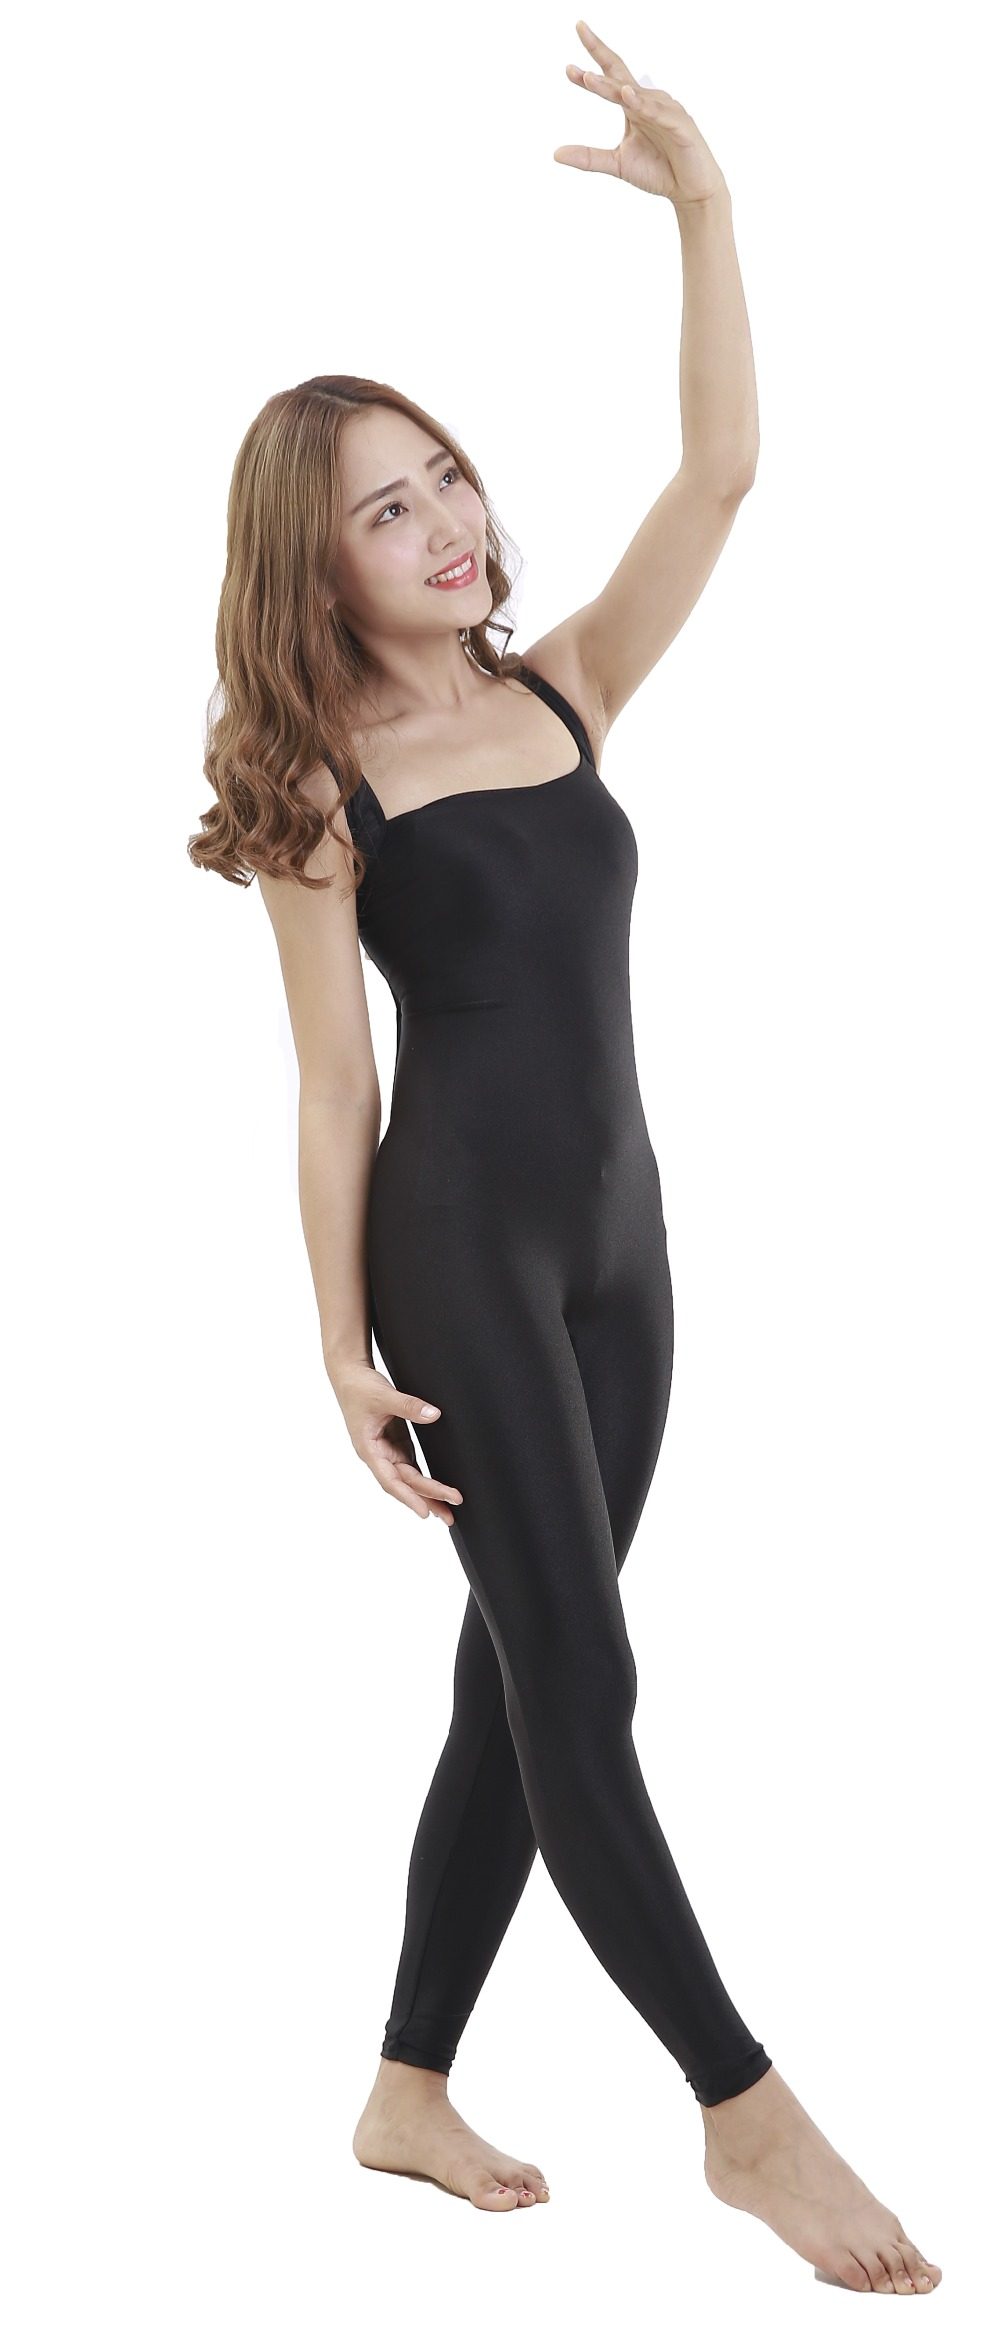 largas volta quadrado pescoço bodysuit dança bodysuit completo